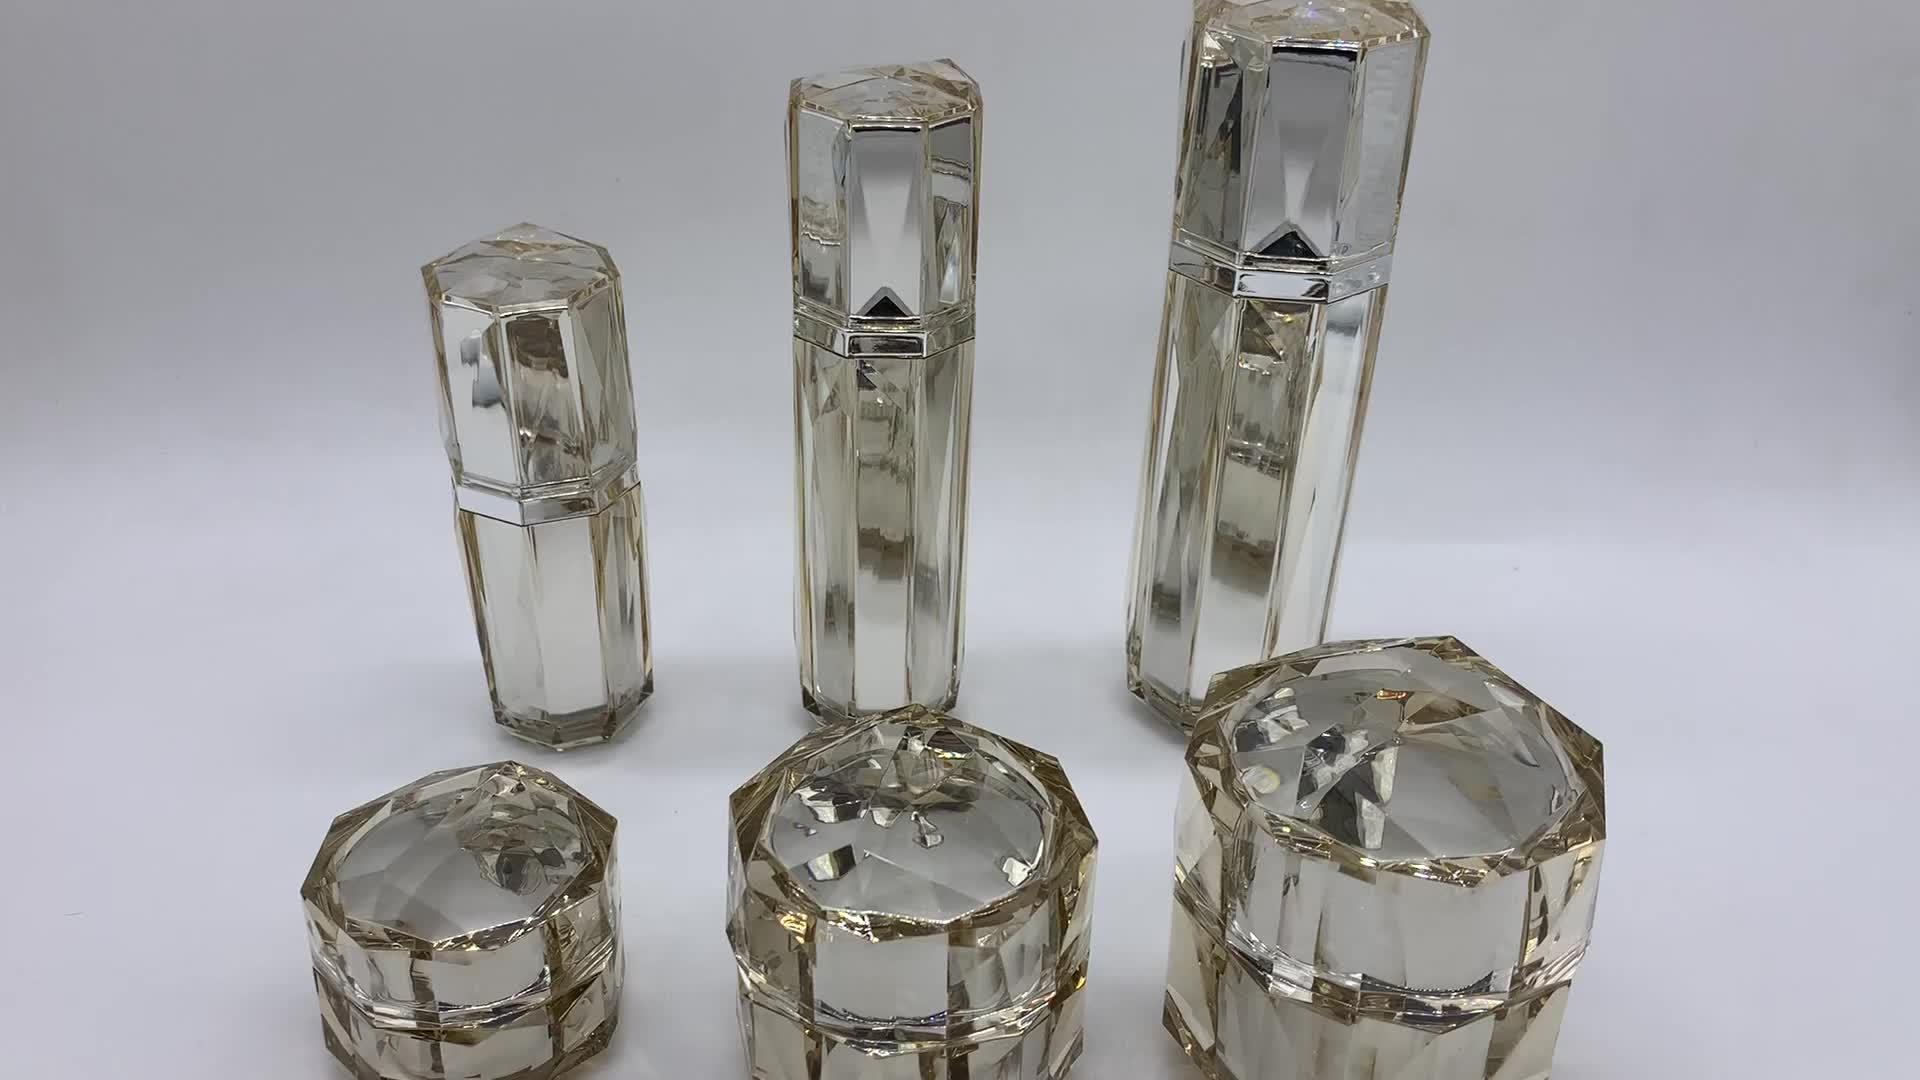 Высококачественная Серебристая акриловая бутылка 15 г 30 г 50 г 30 мл 50 мл 100 мл